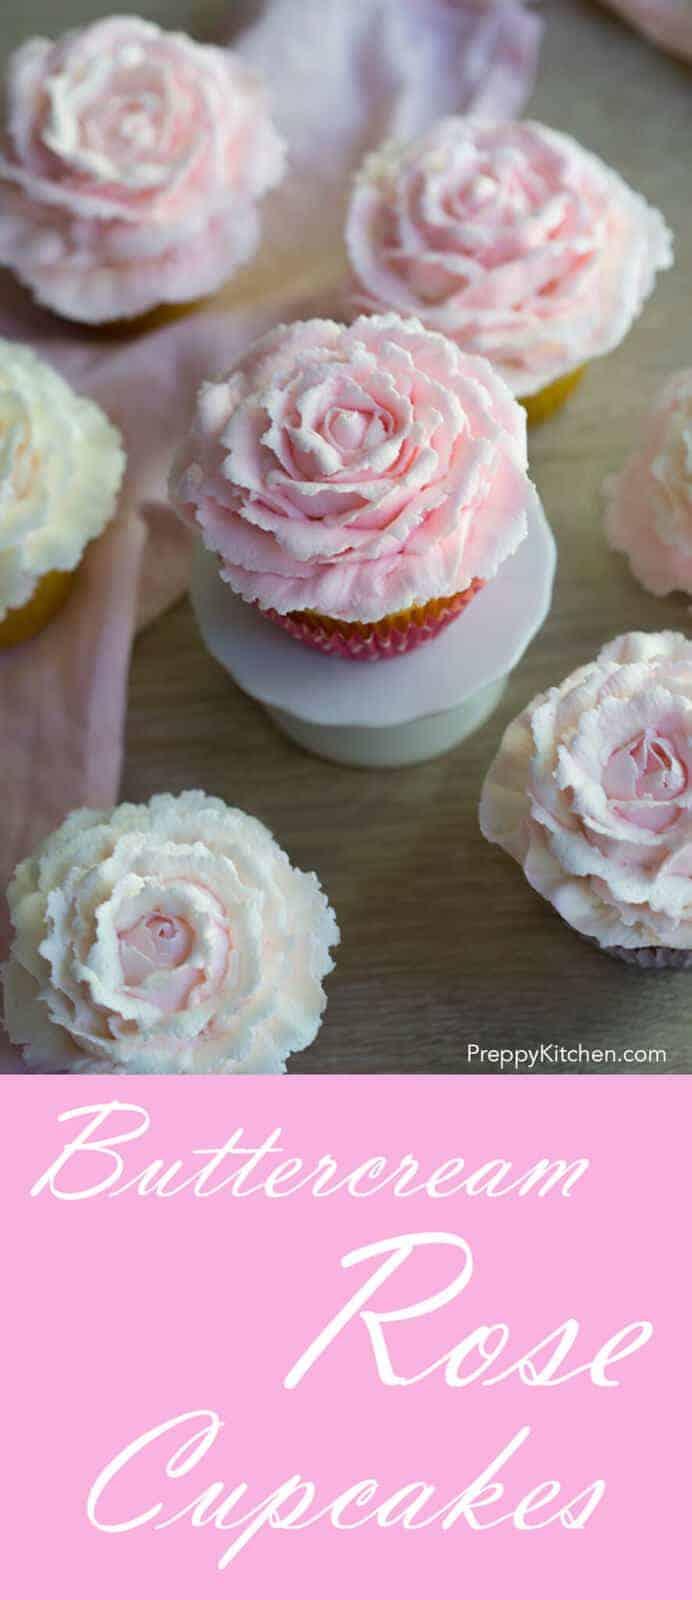 Rose cupcakes preppy kitchen beautiful buttercream roses top a moist vanilla cupcake izmirmasajfo